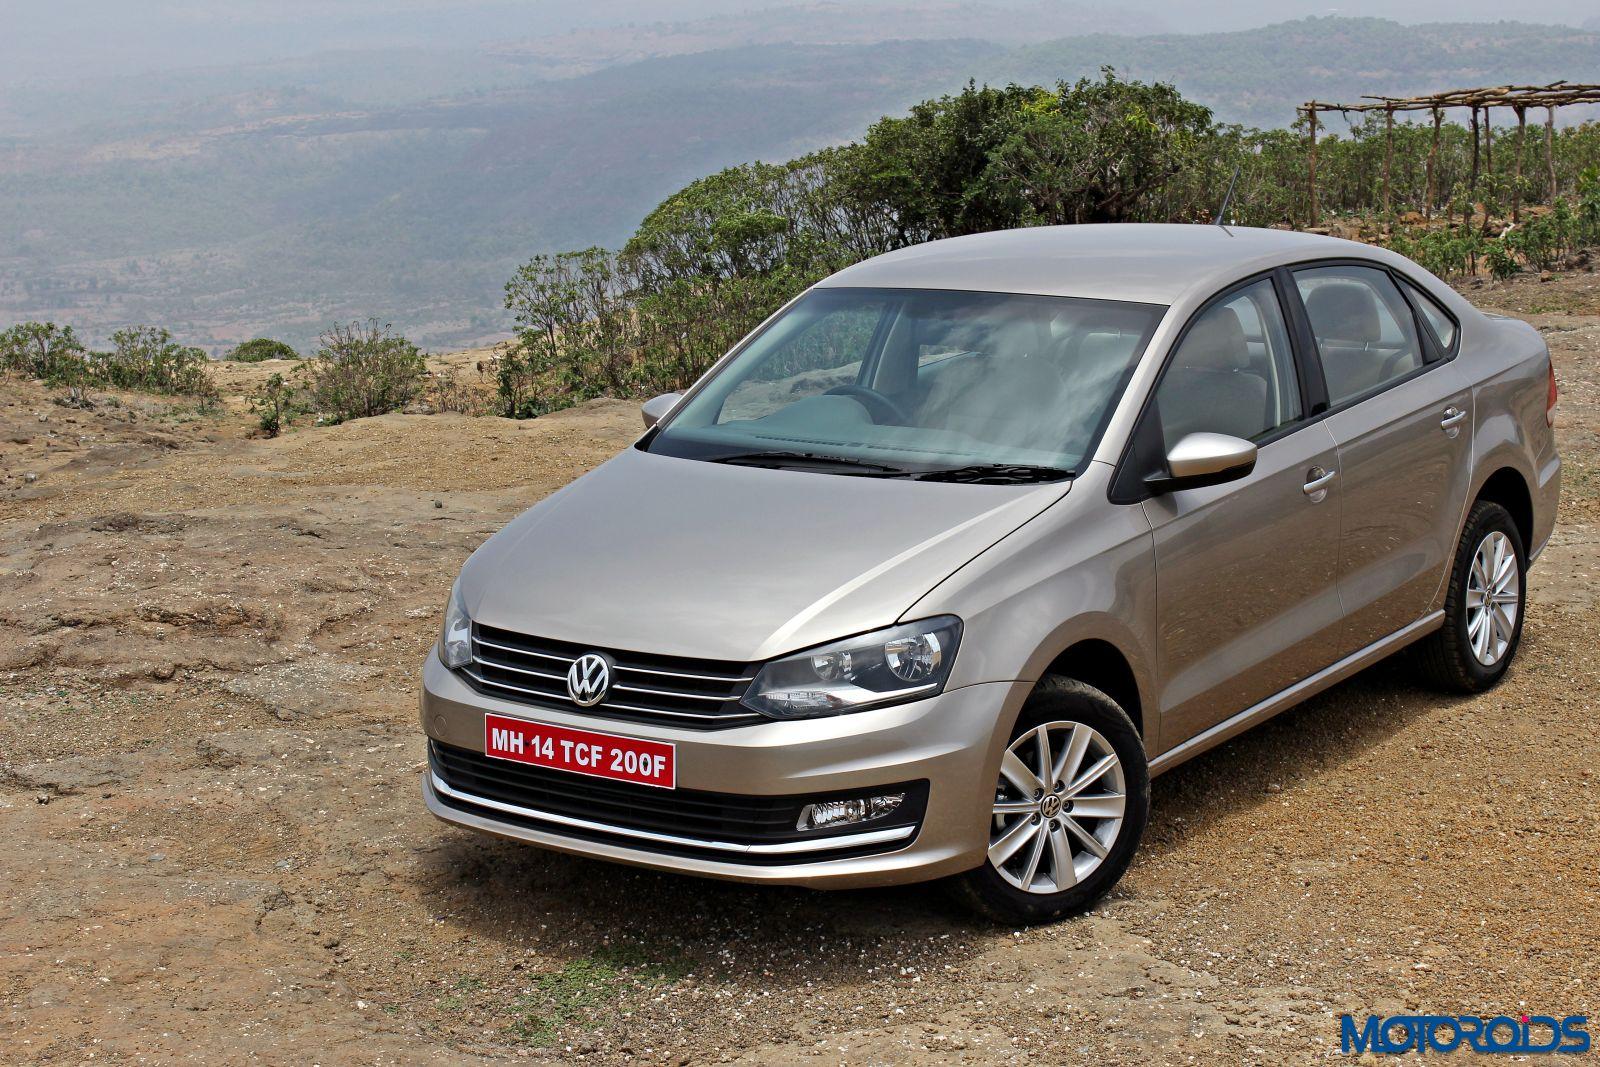 New 2015 Volkswagen Vento 1 5 Diesel Facelift Review